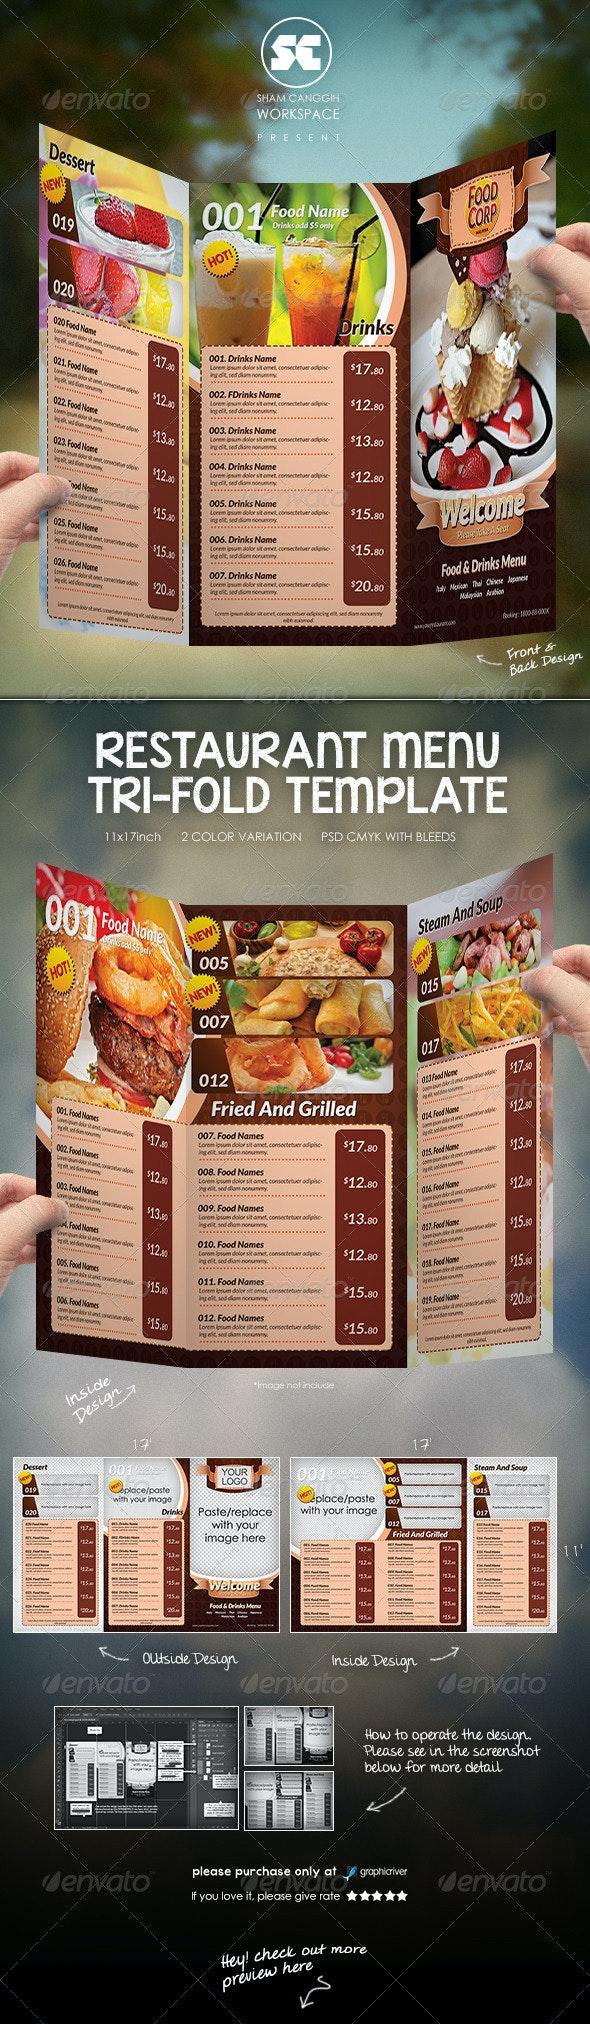 Tri-Fold Restaurant Menu Template - Food Menus Print Templates